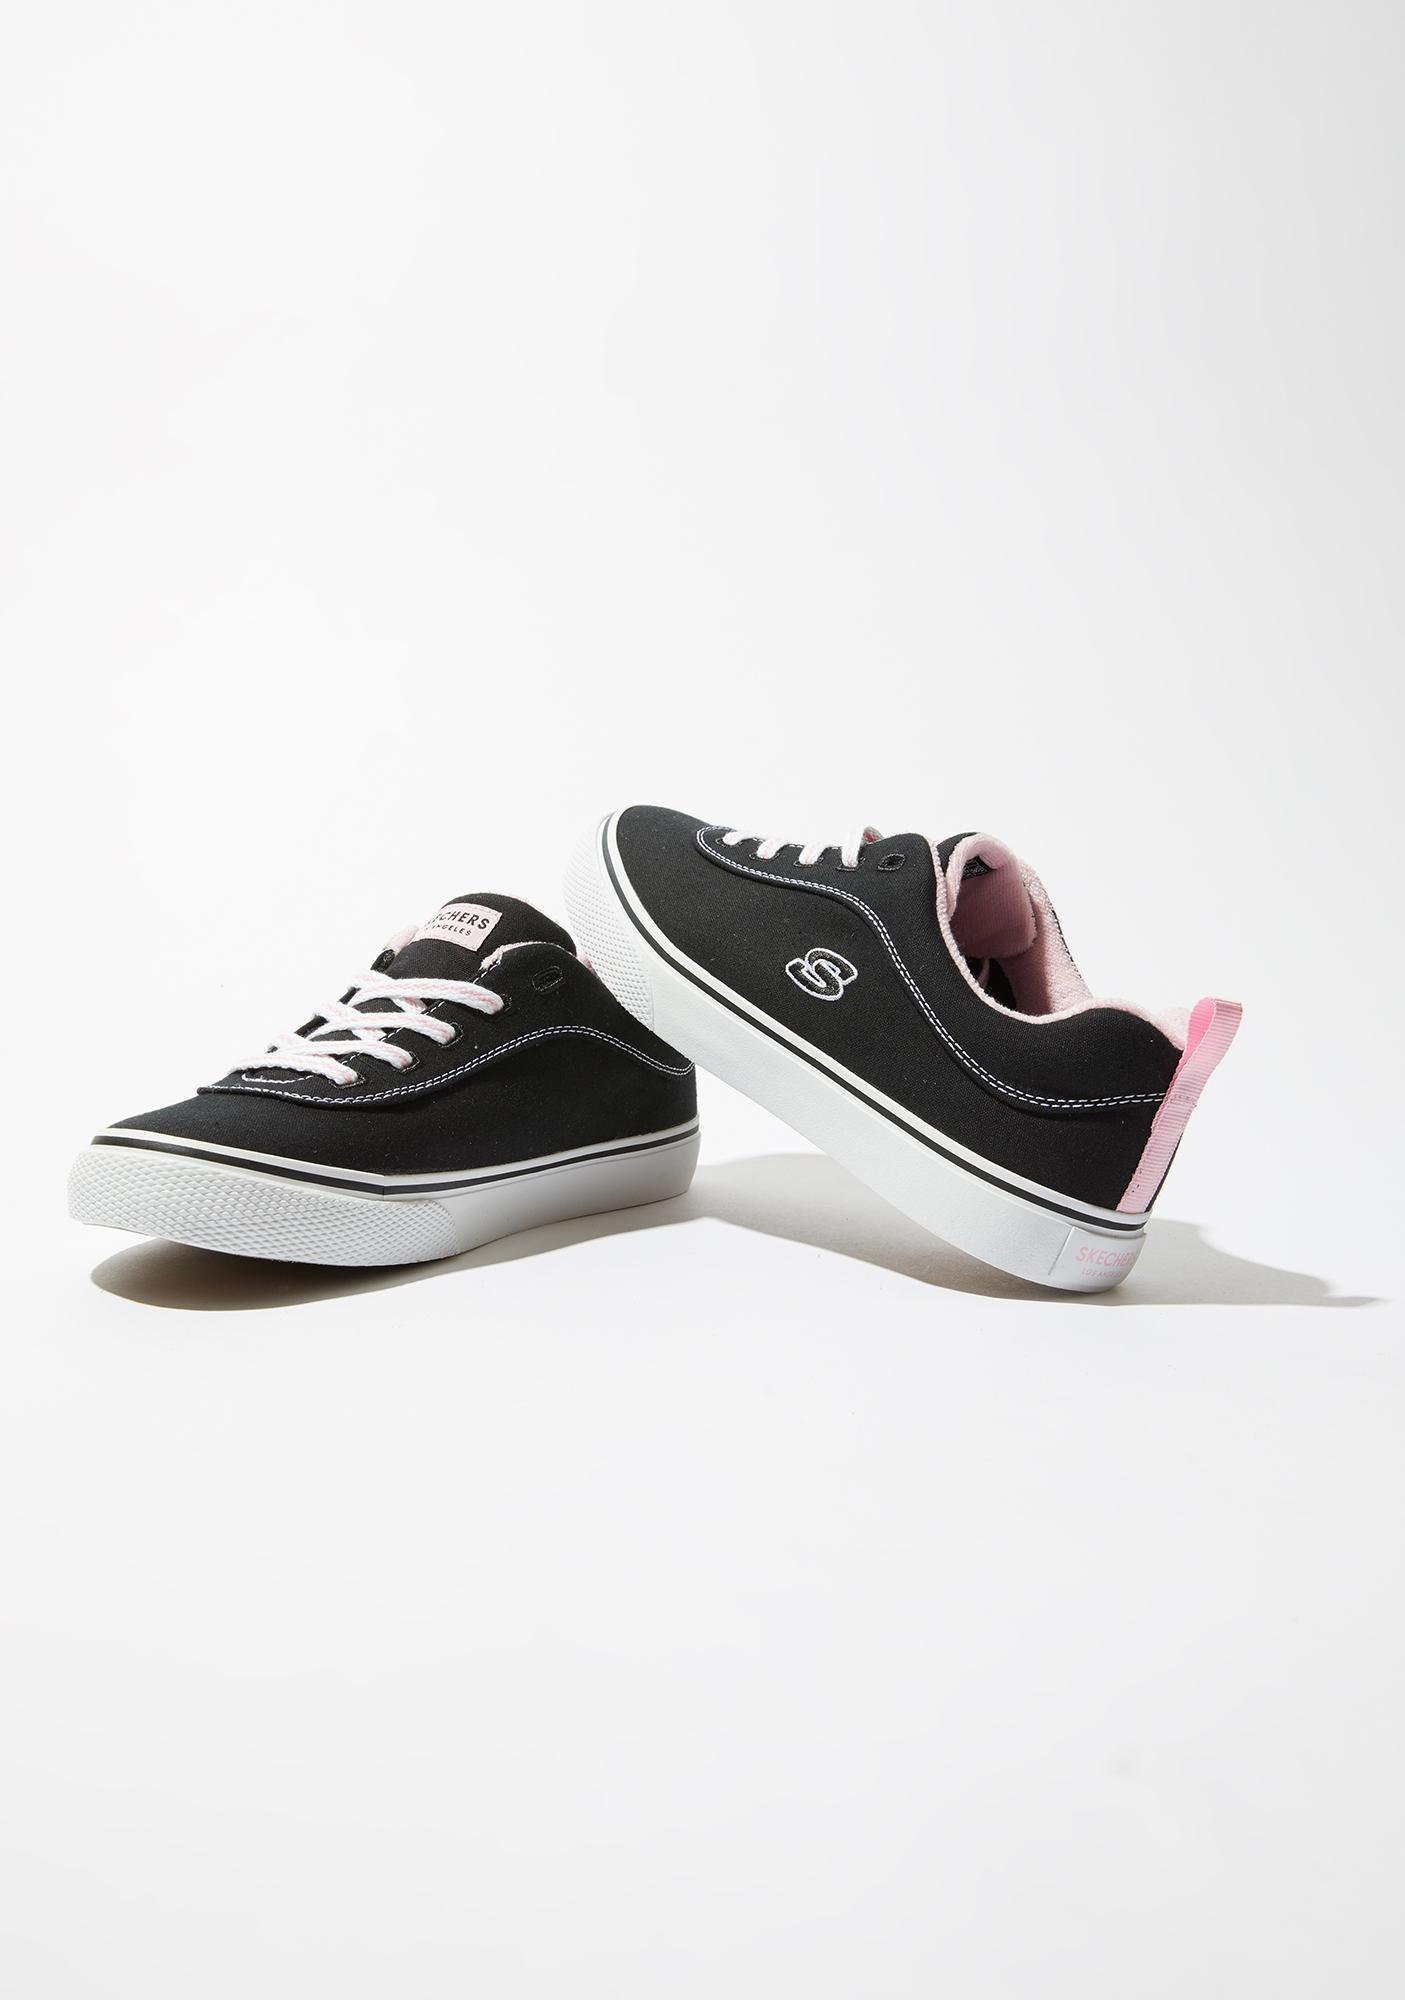 Skechers V'Lites Stitch N Stride Sneakers